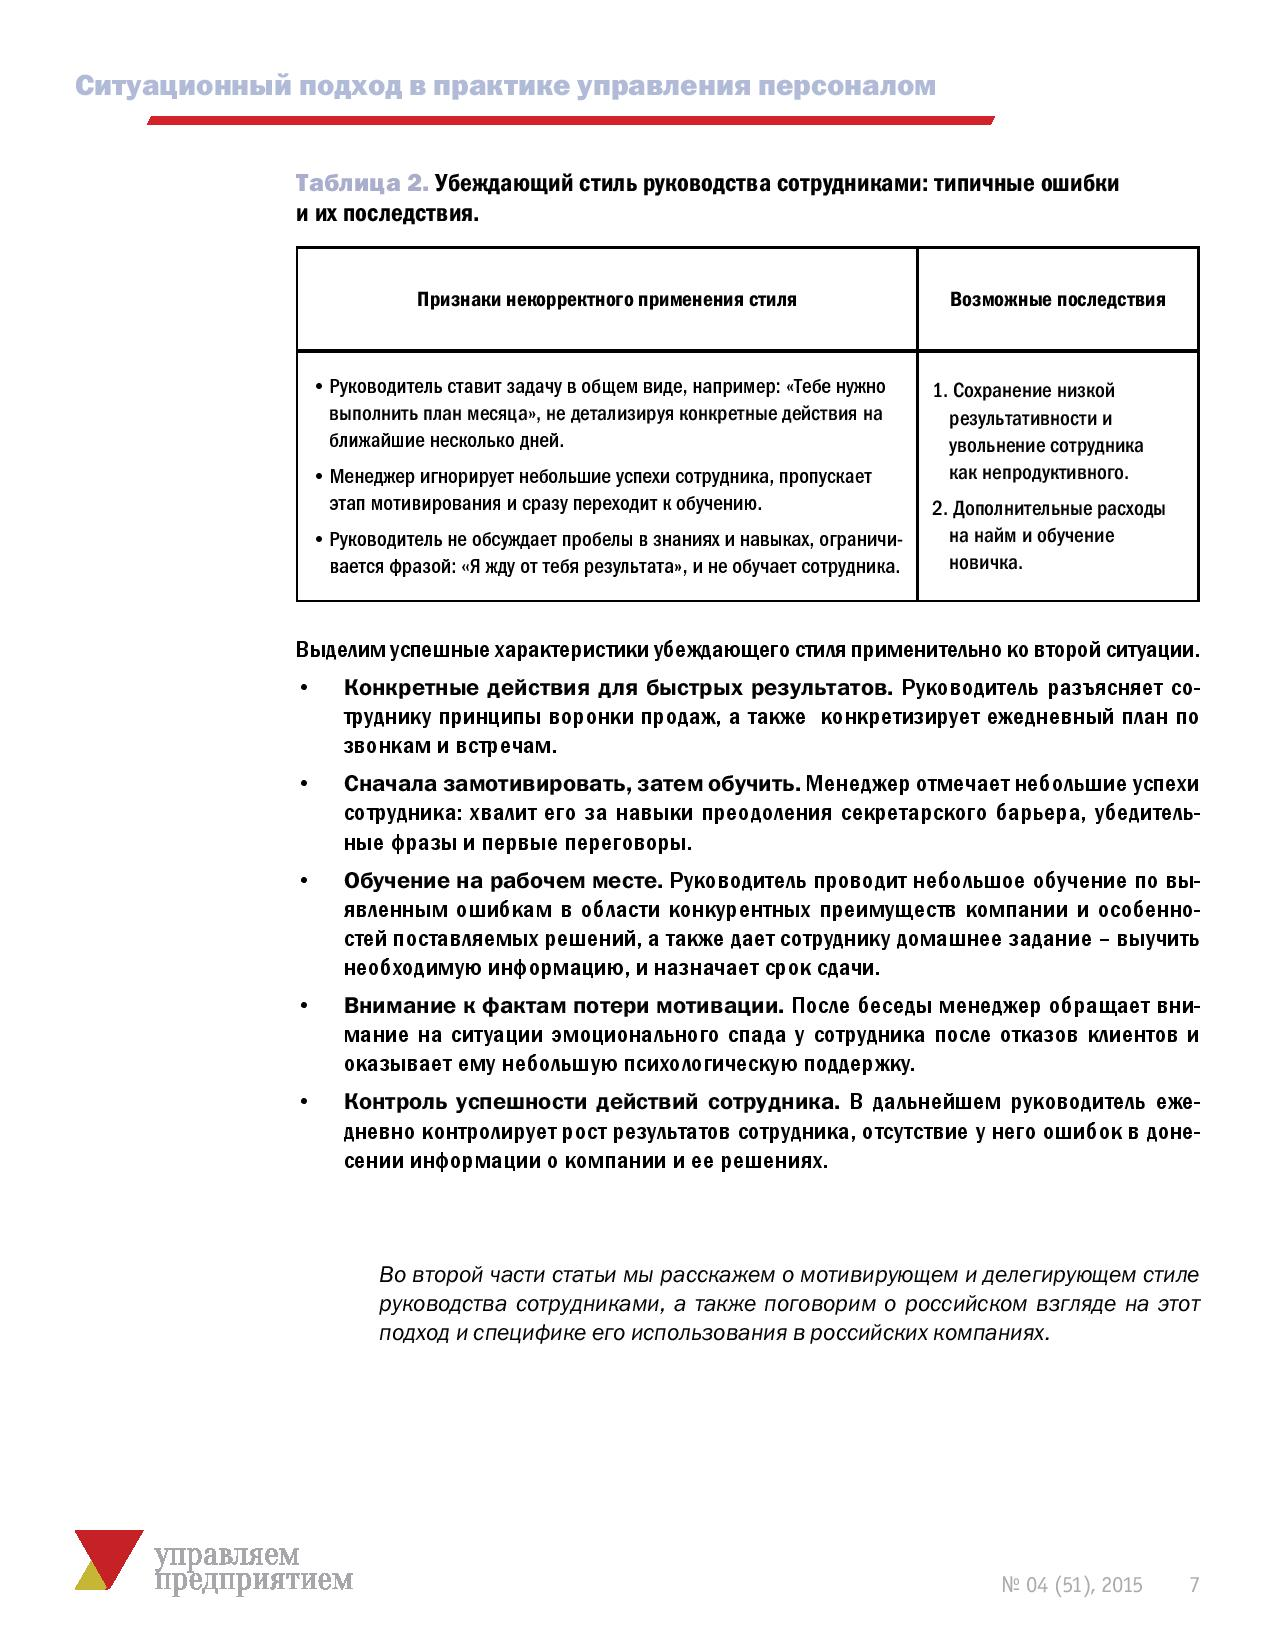 Situacionnyy_podhod_Cast__1._Upravlaem_predpriatiem__04_2015-page-007